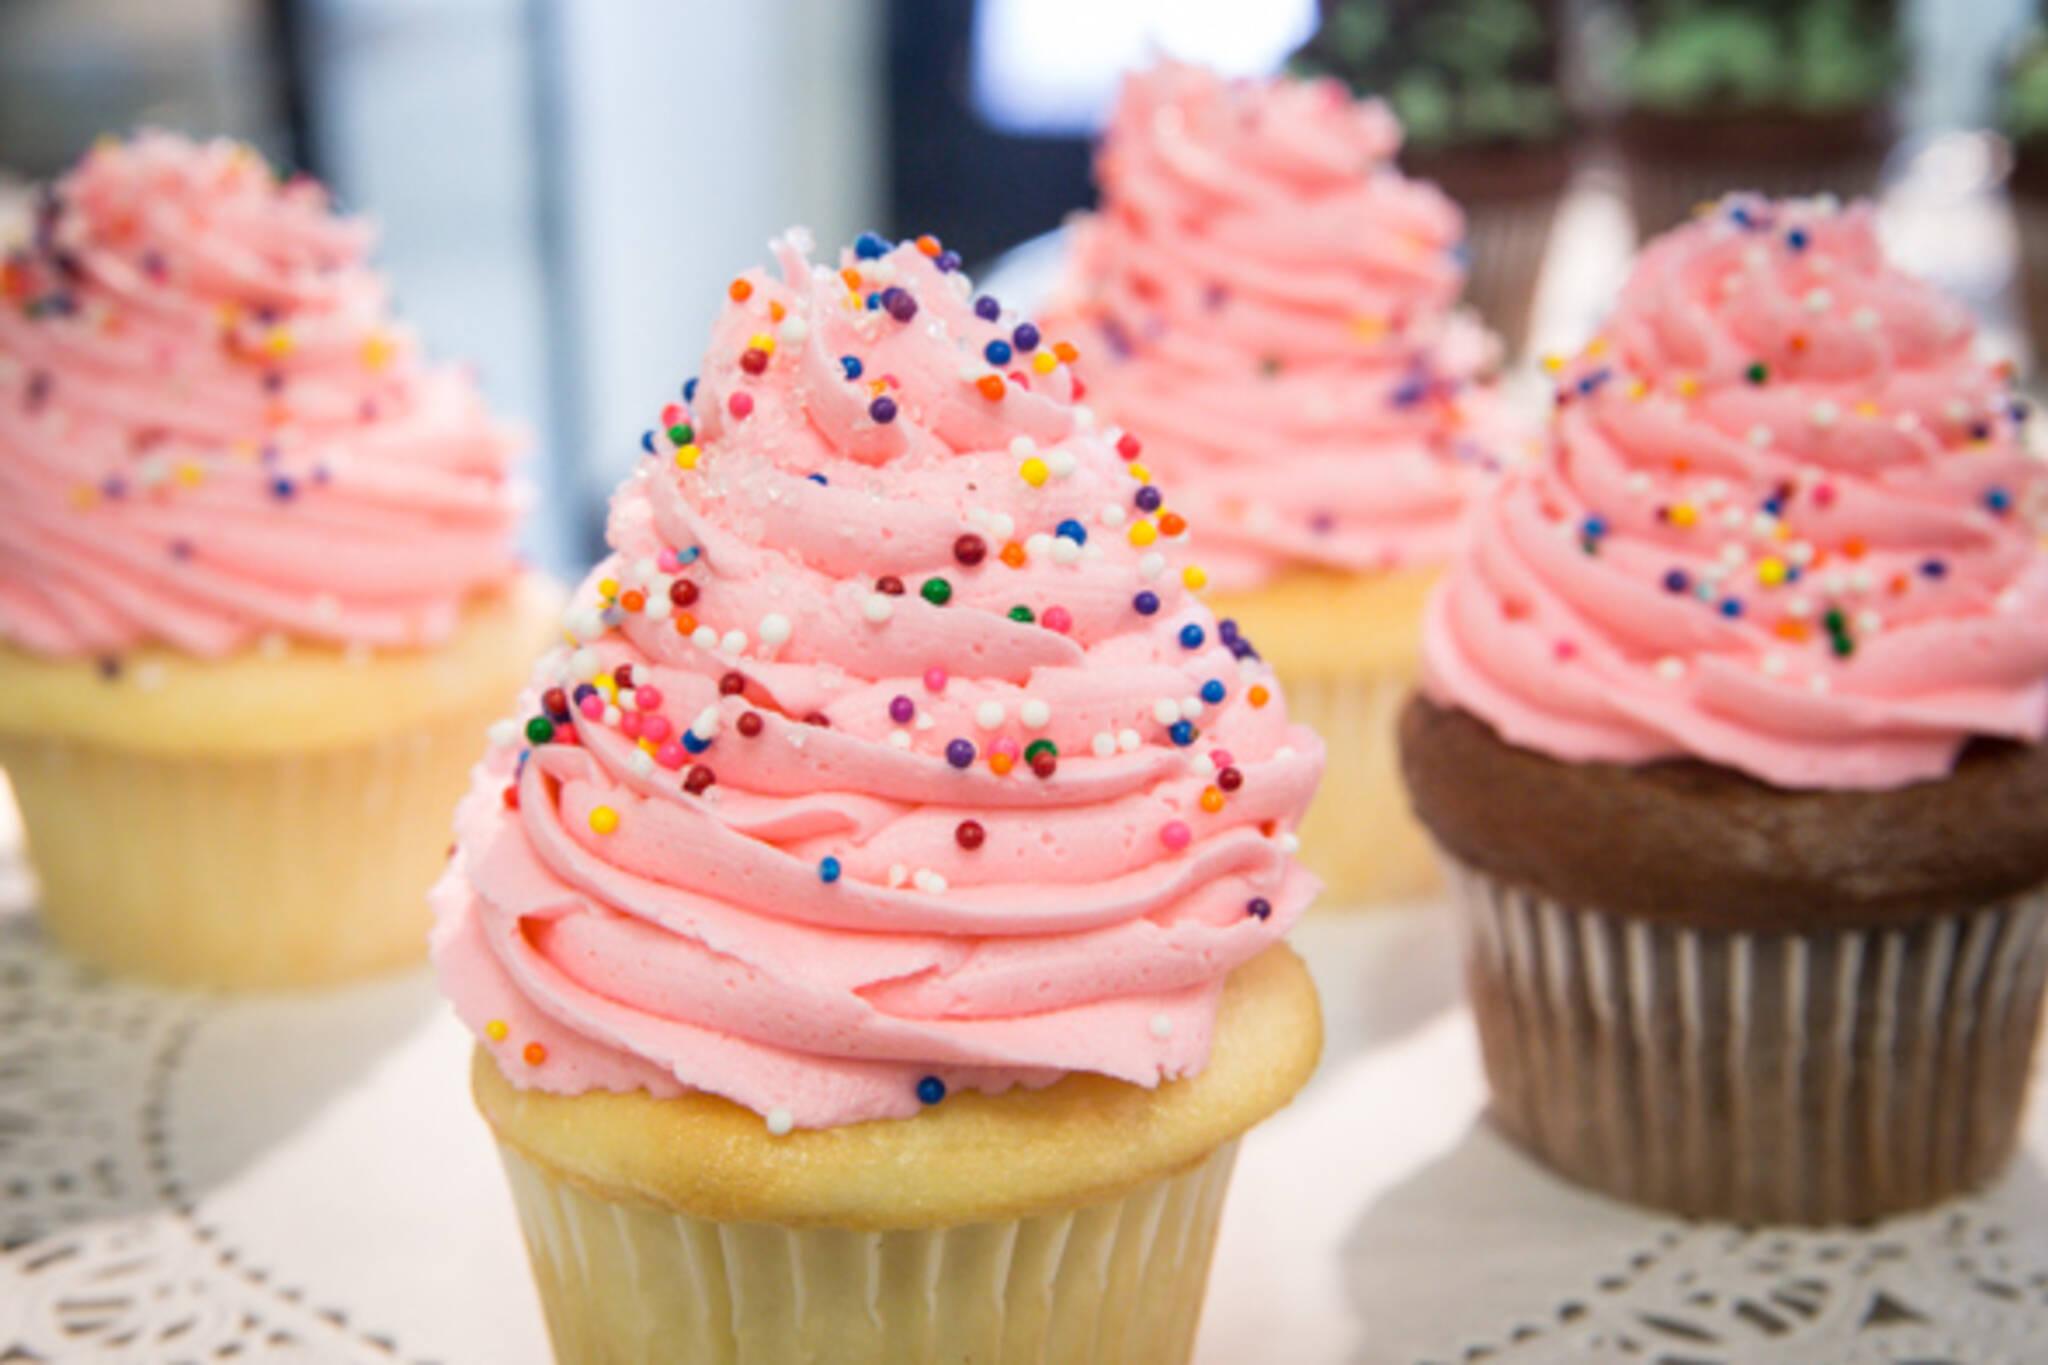 Tori and Cates Cupcakes